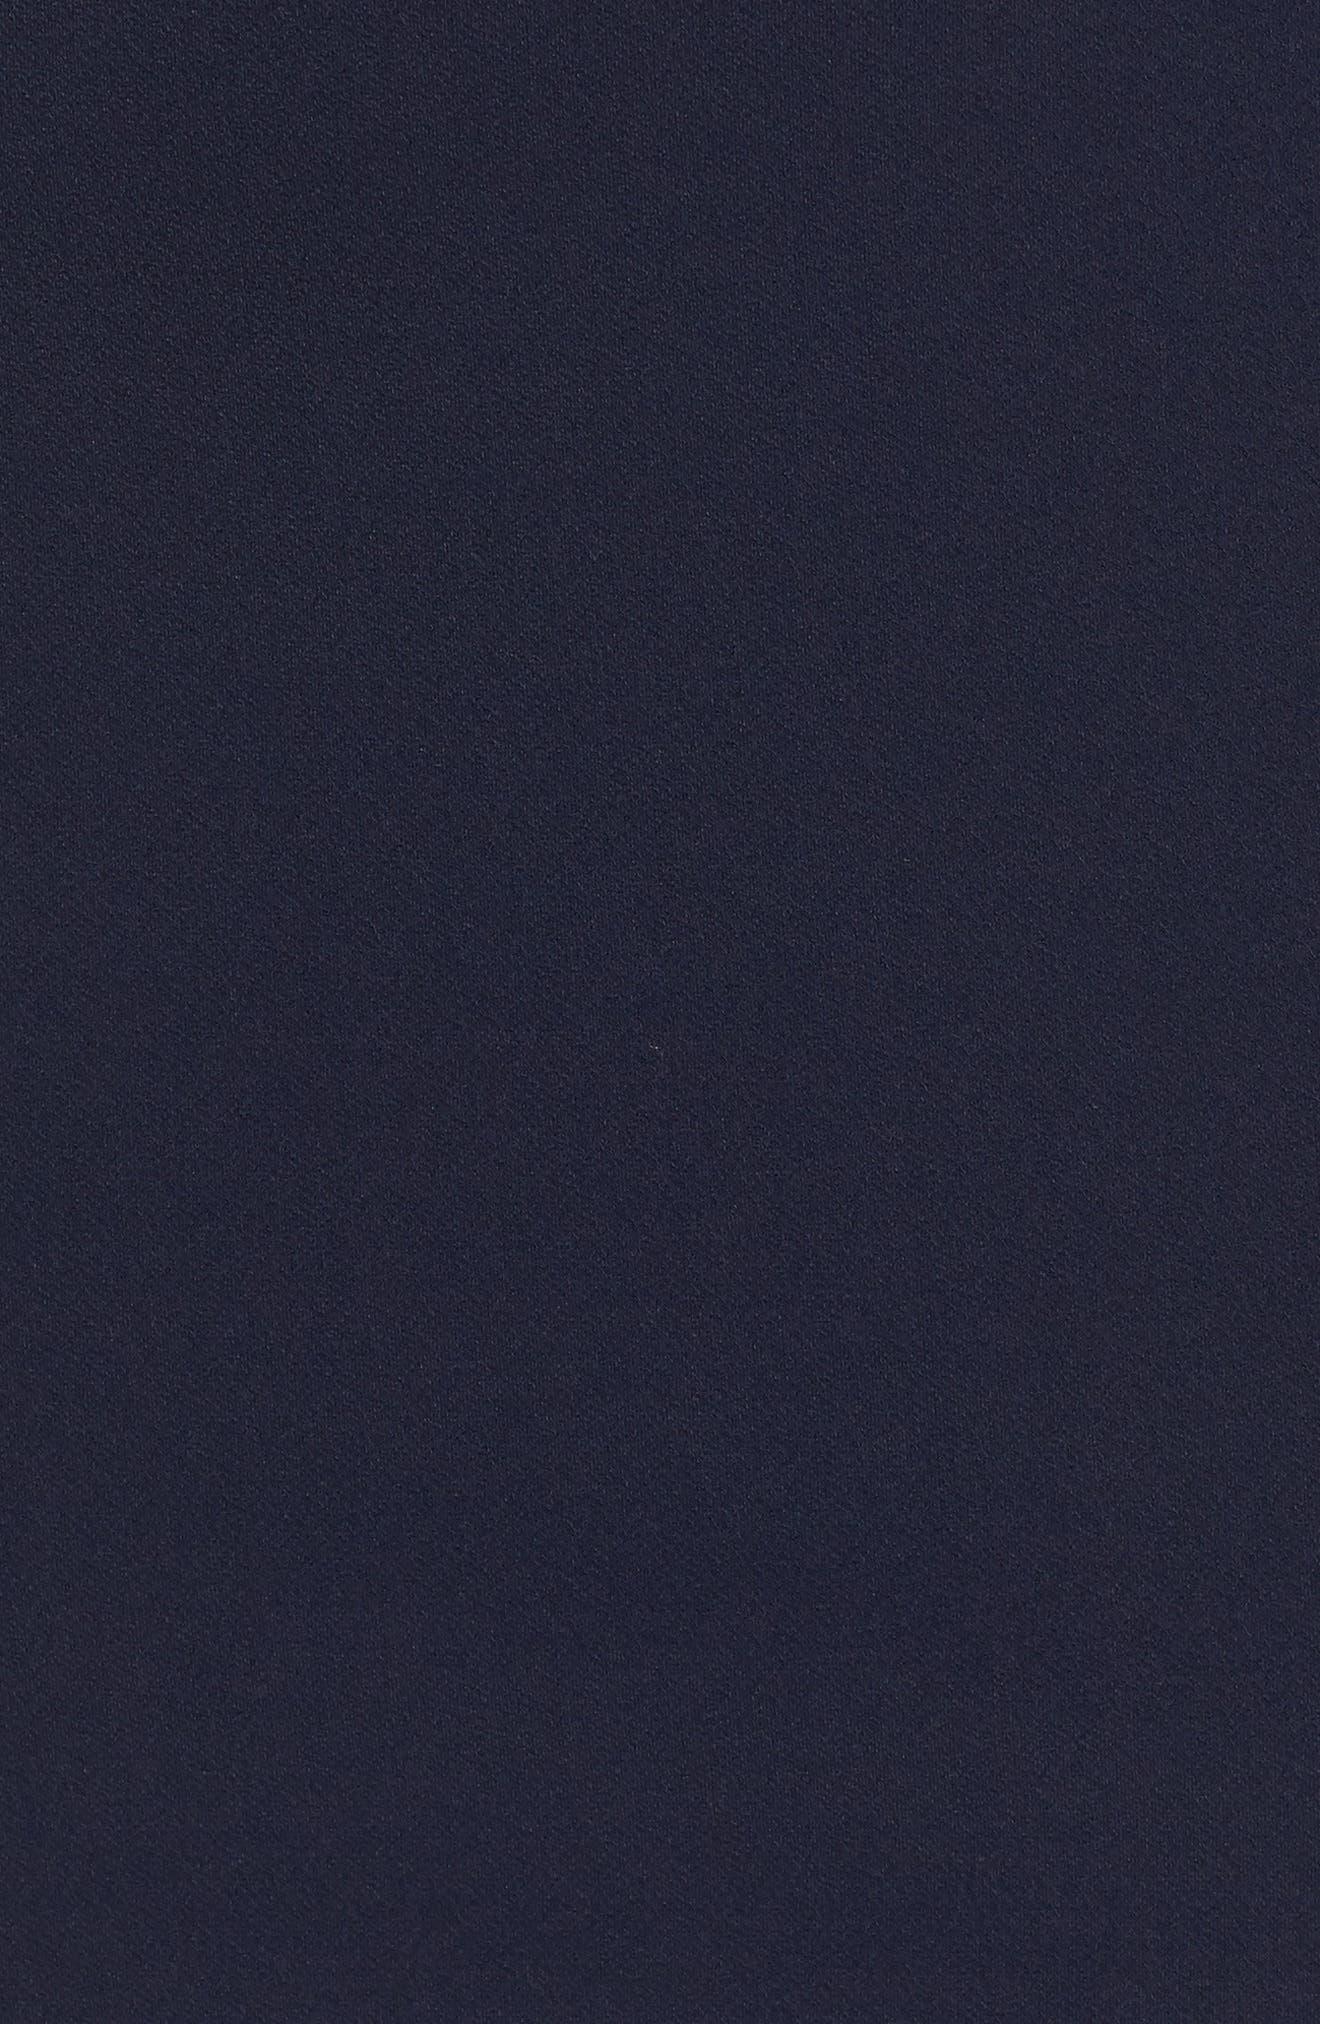 Ruffle Sleeve Scuba Shift Dress,                             Alternate thumbnail 6, color,                             Navy